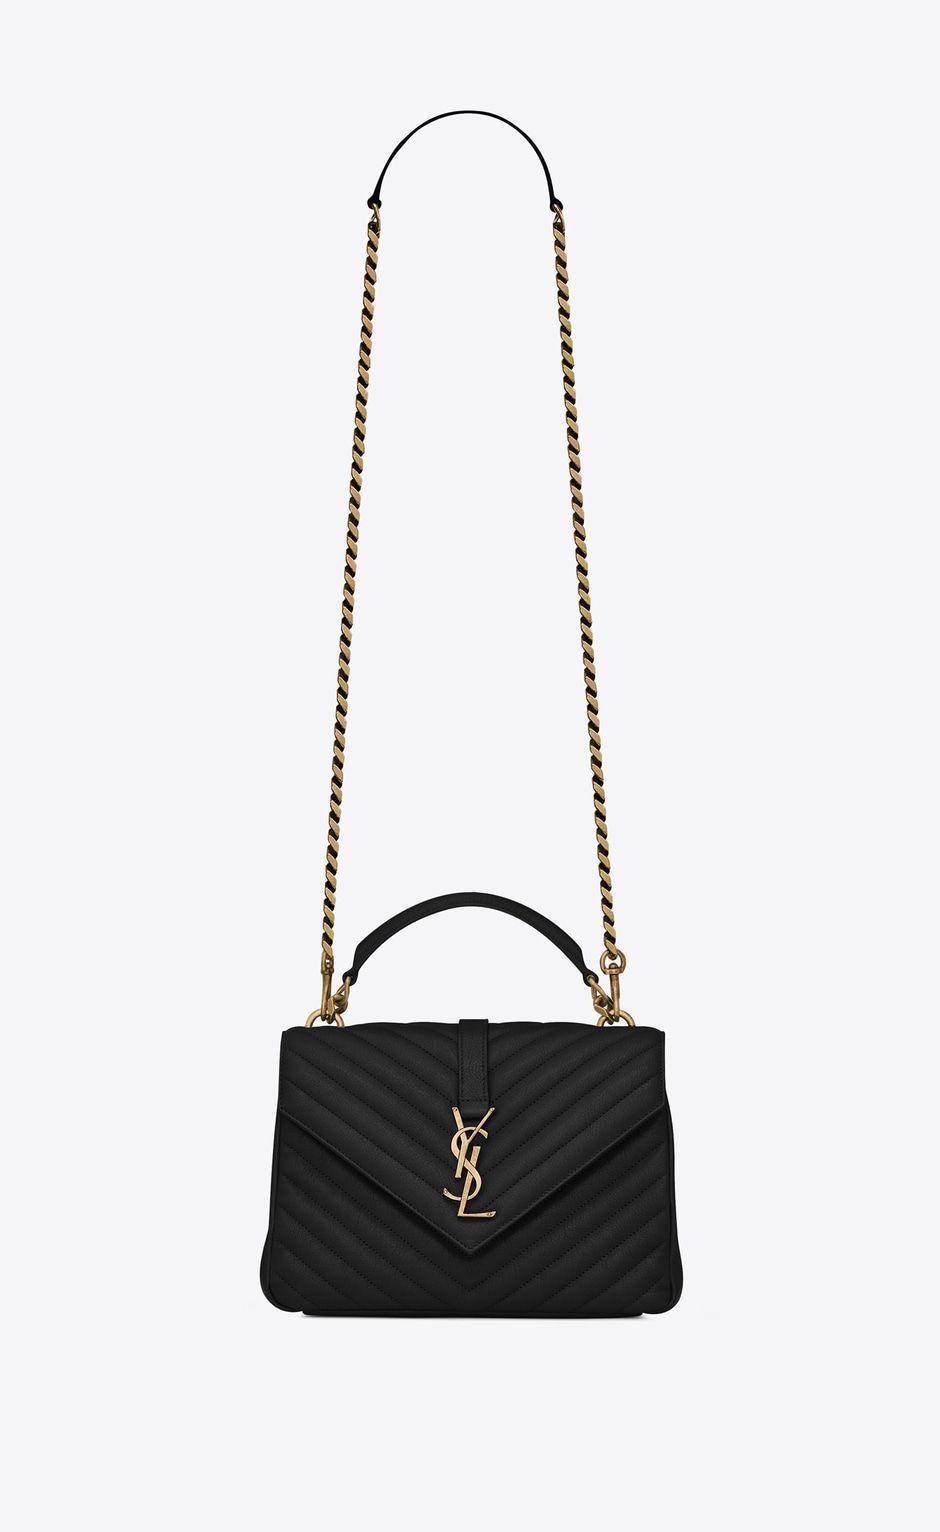 Saint Laurent Medium Collège Bag In Black Matelassé Leather And Vintage  Gold Toned Hardware  0b40042ecc25c